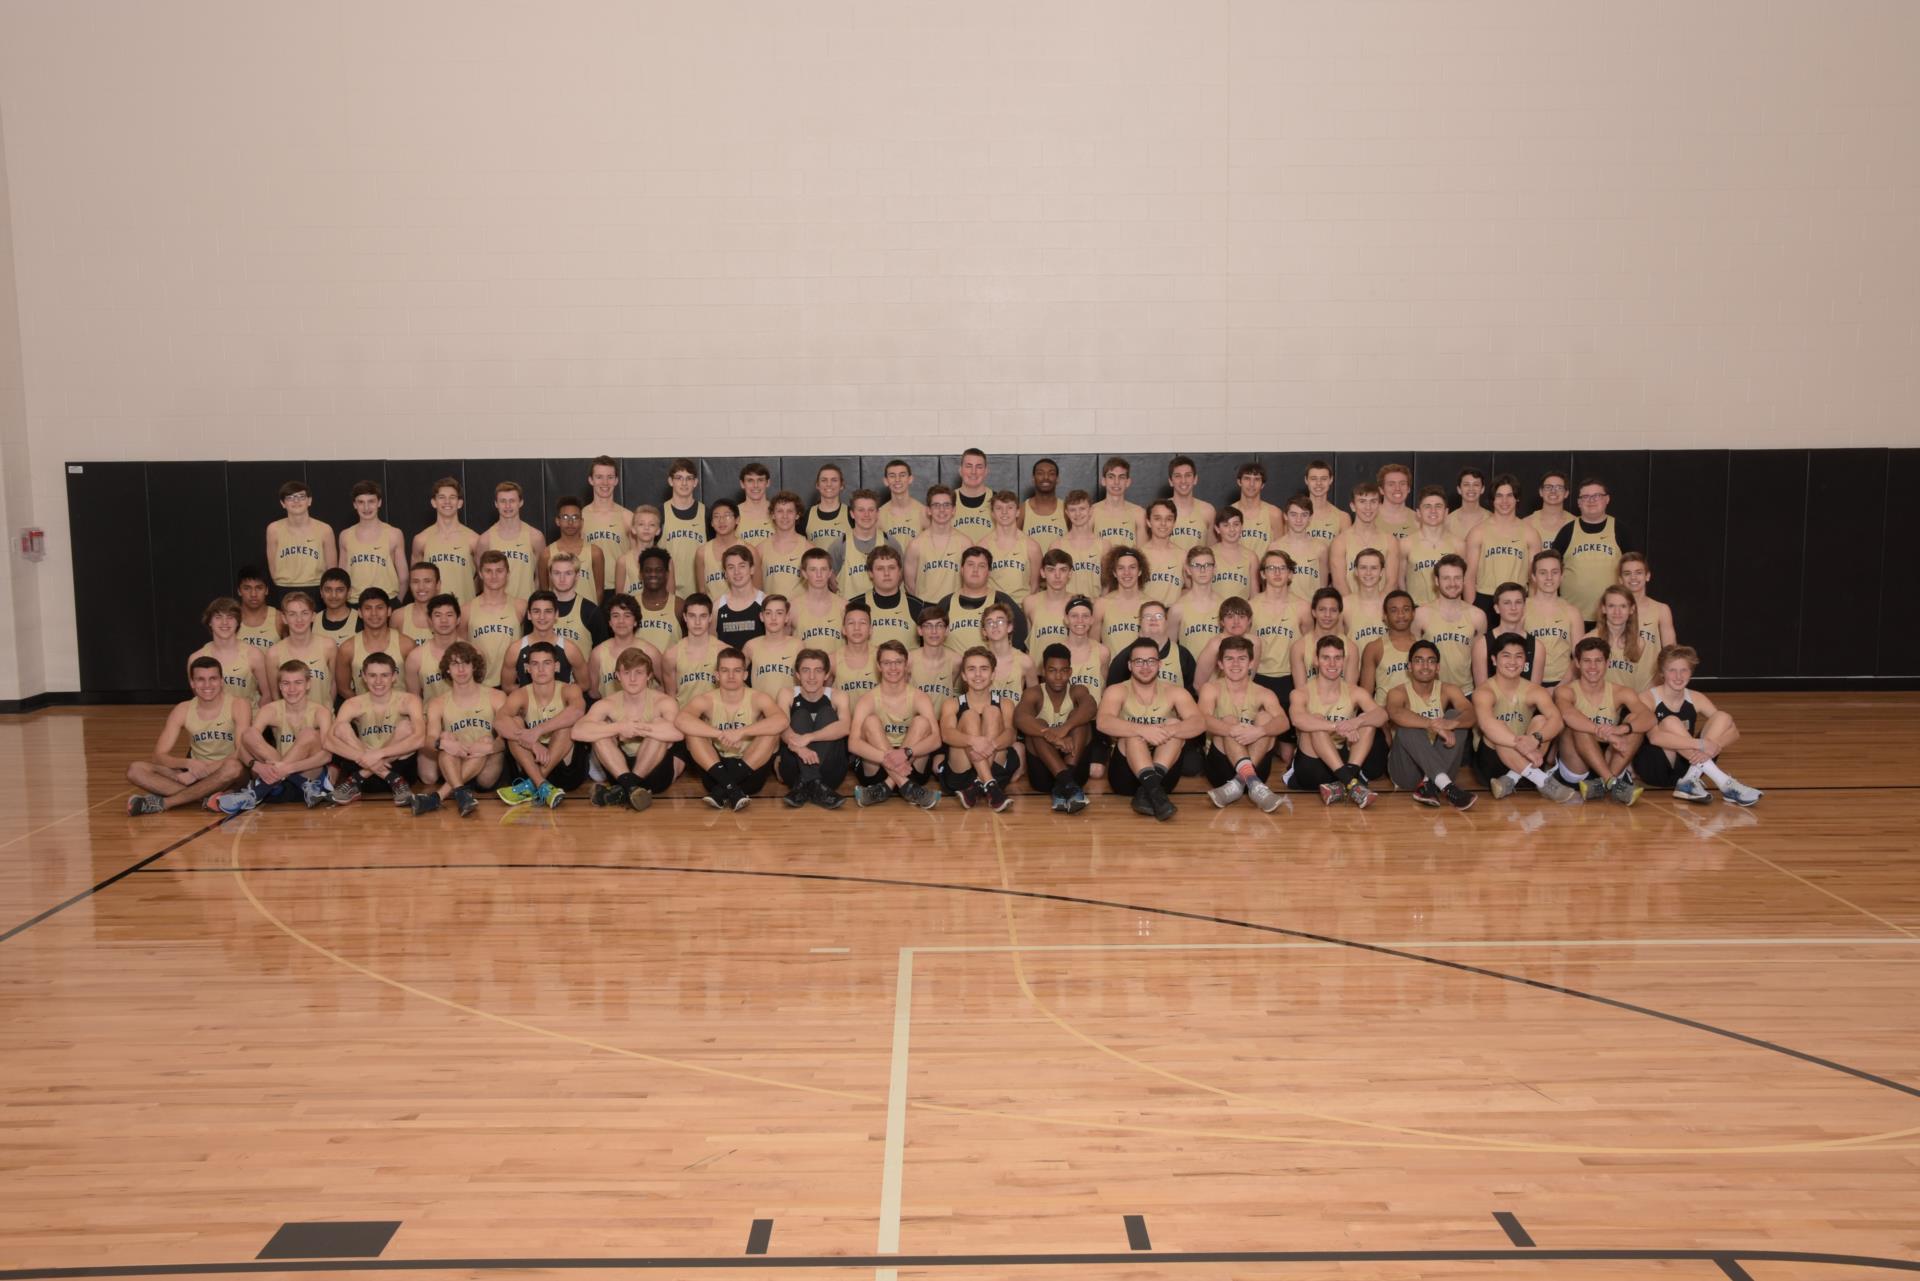 PHS Boys Track n Field Team Photo